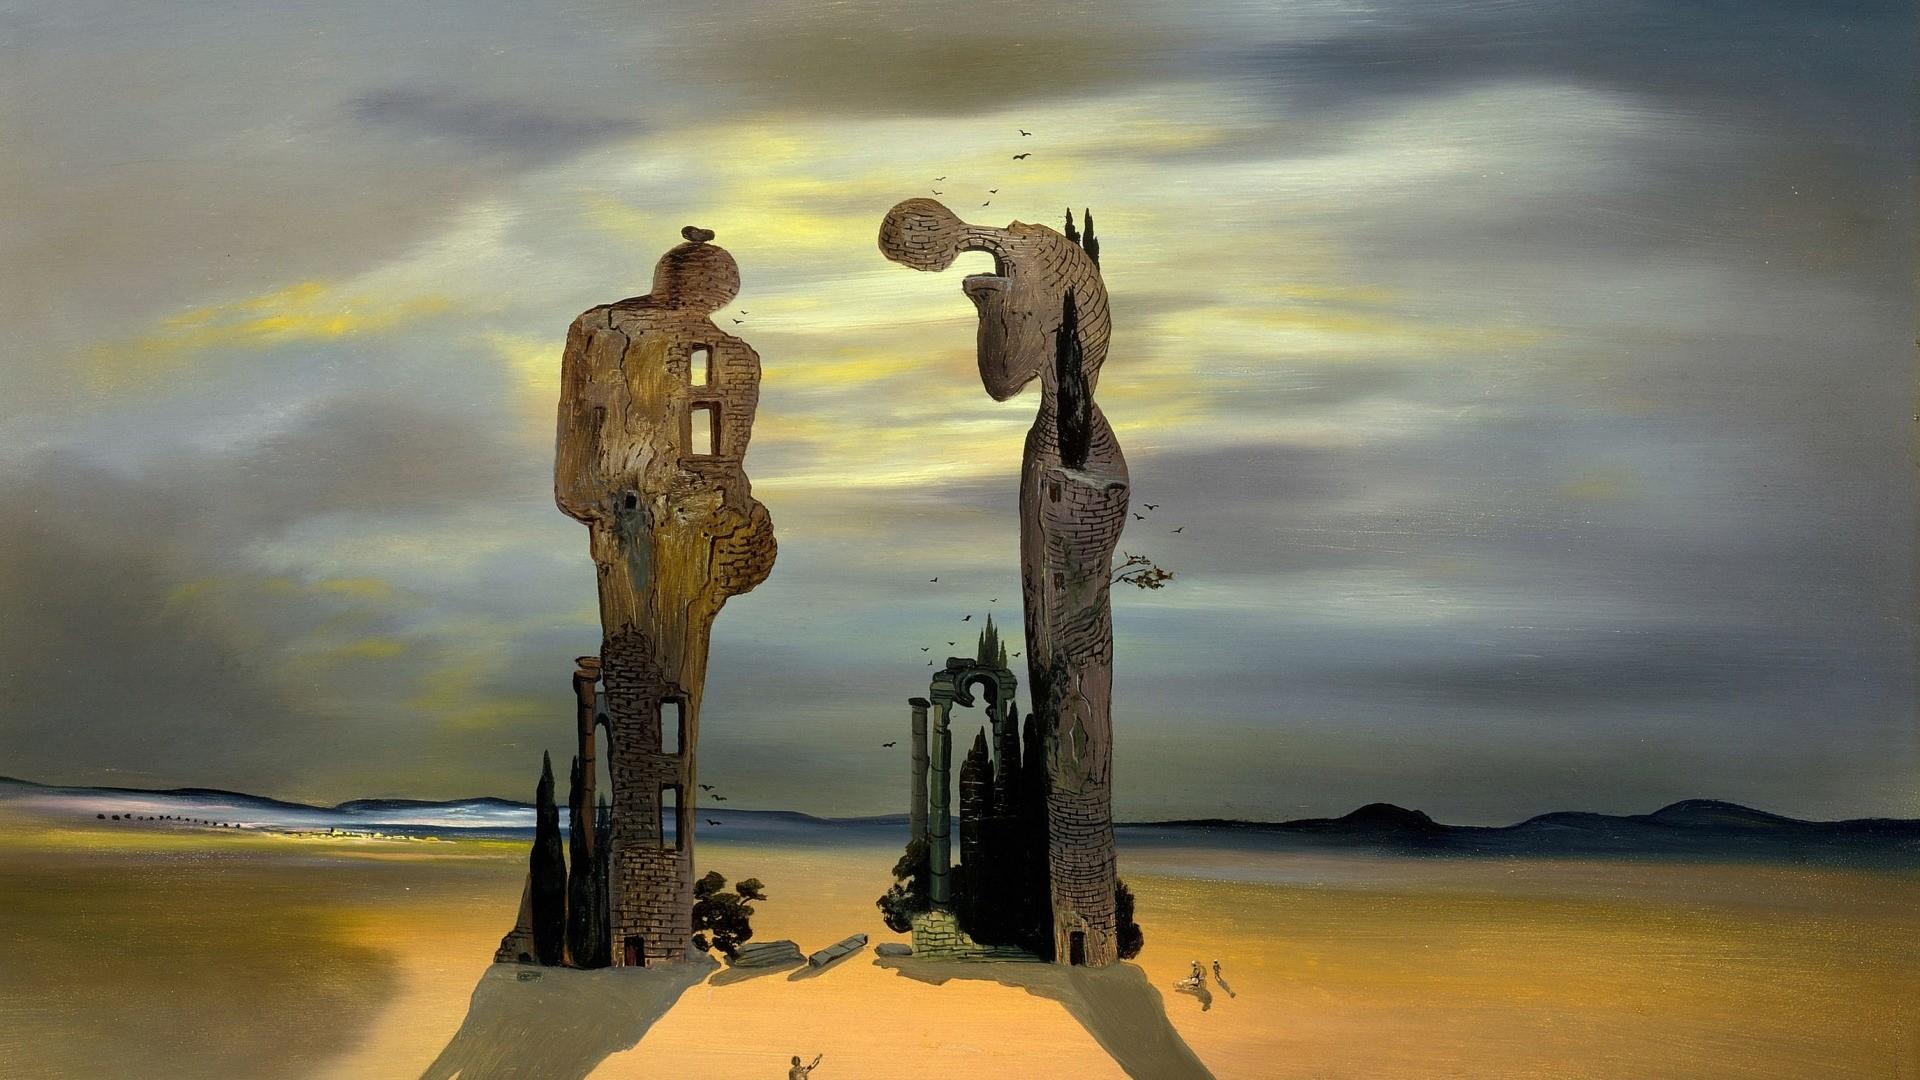 Surrealism Art wallpaper photo hd